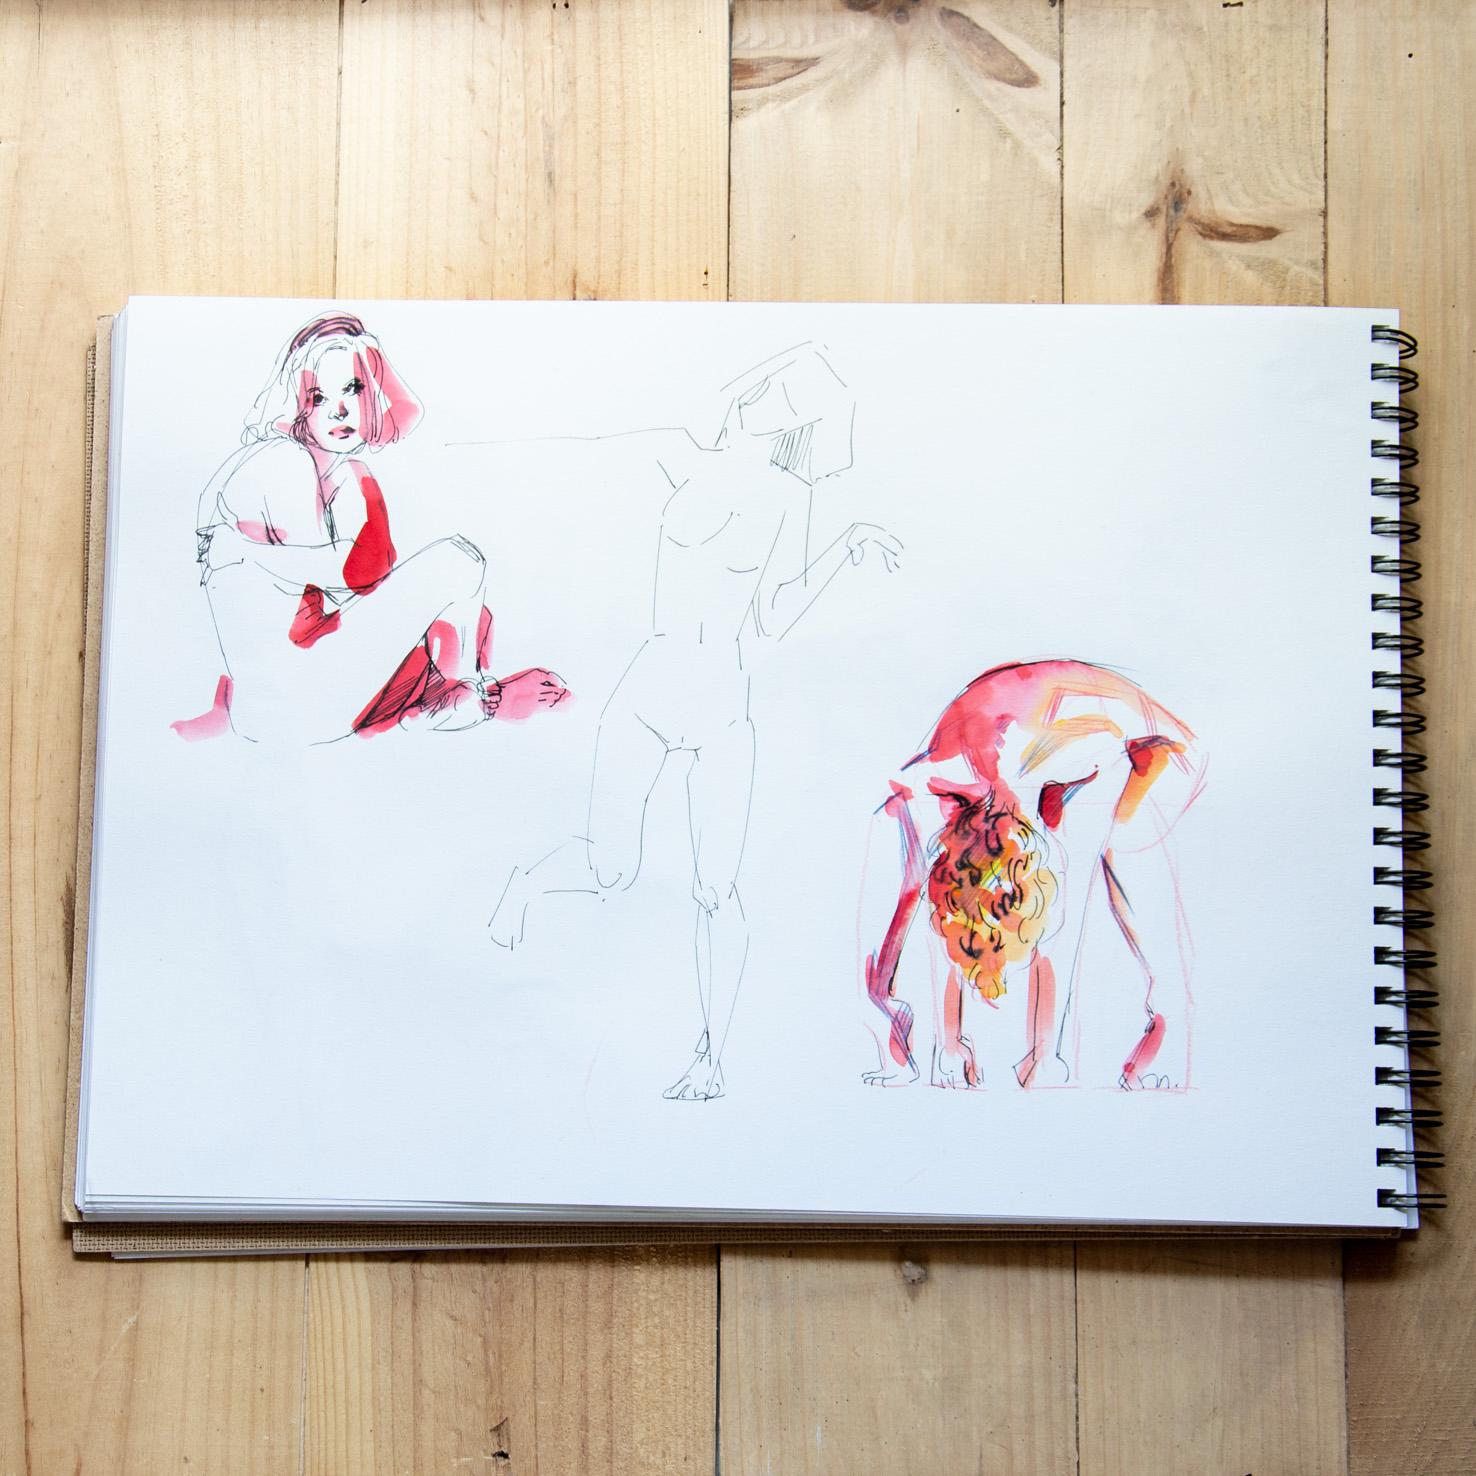 Sketchbook : IsaArne [ Challenge de l'ete P7 ] - Page 5 Facecr32